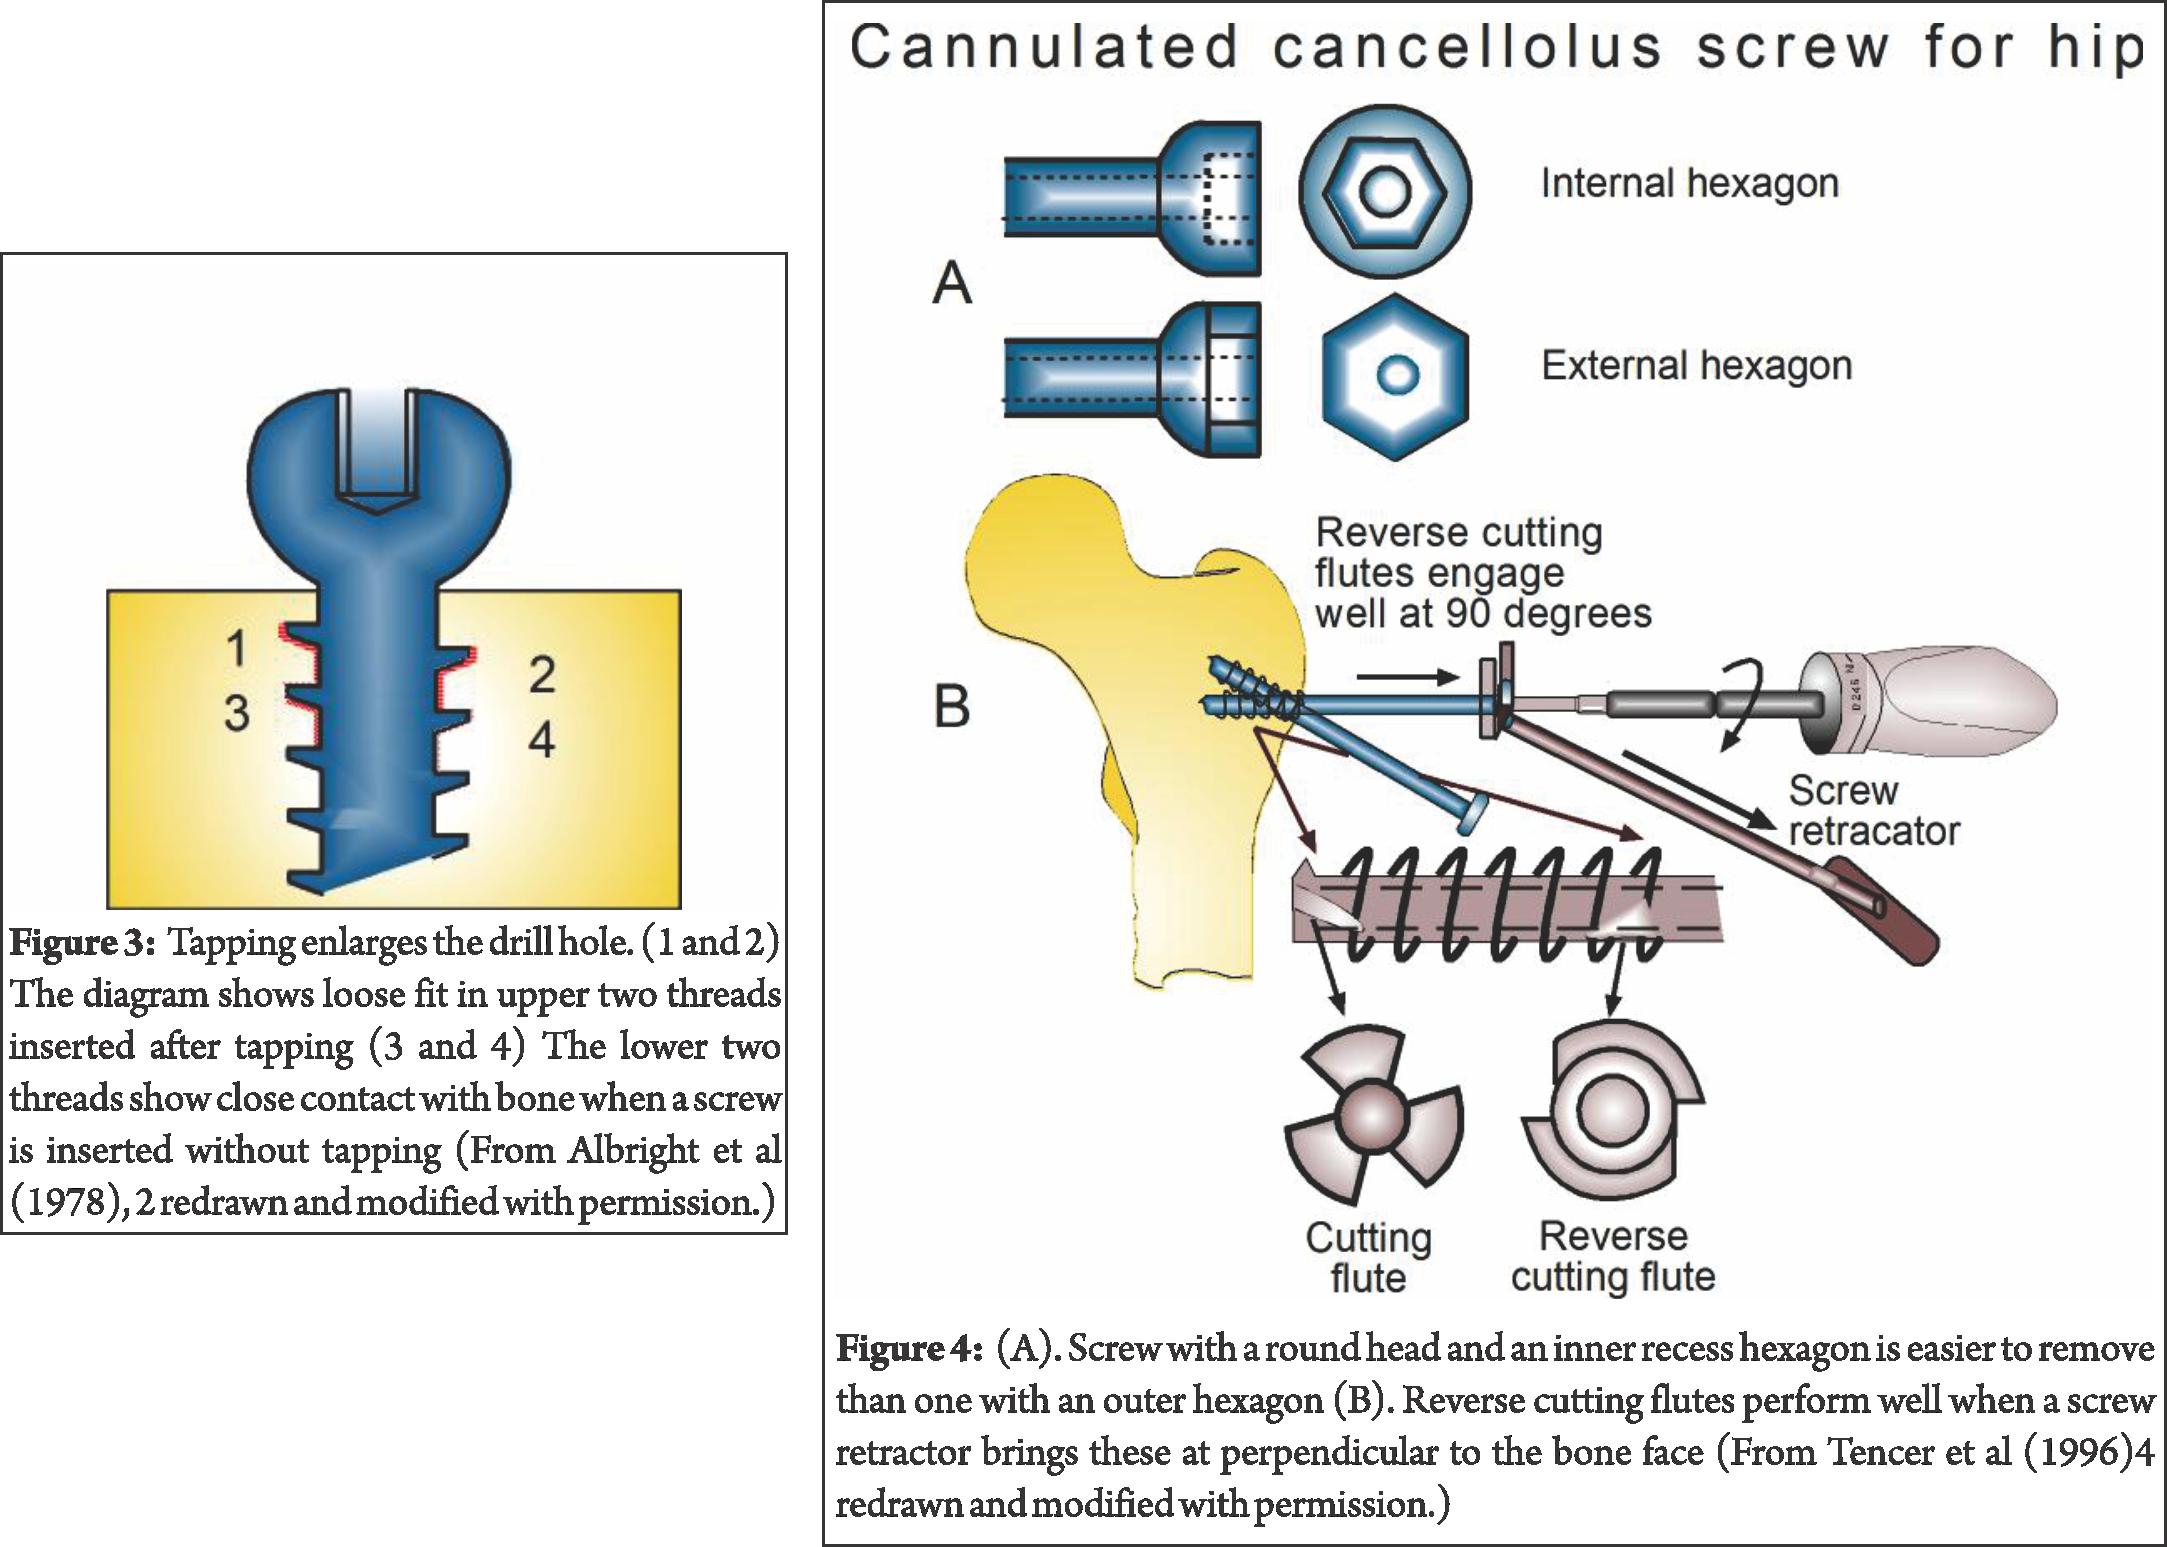 Biomechanics archives trauma international. Screwdriver clipart diagram